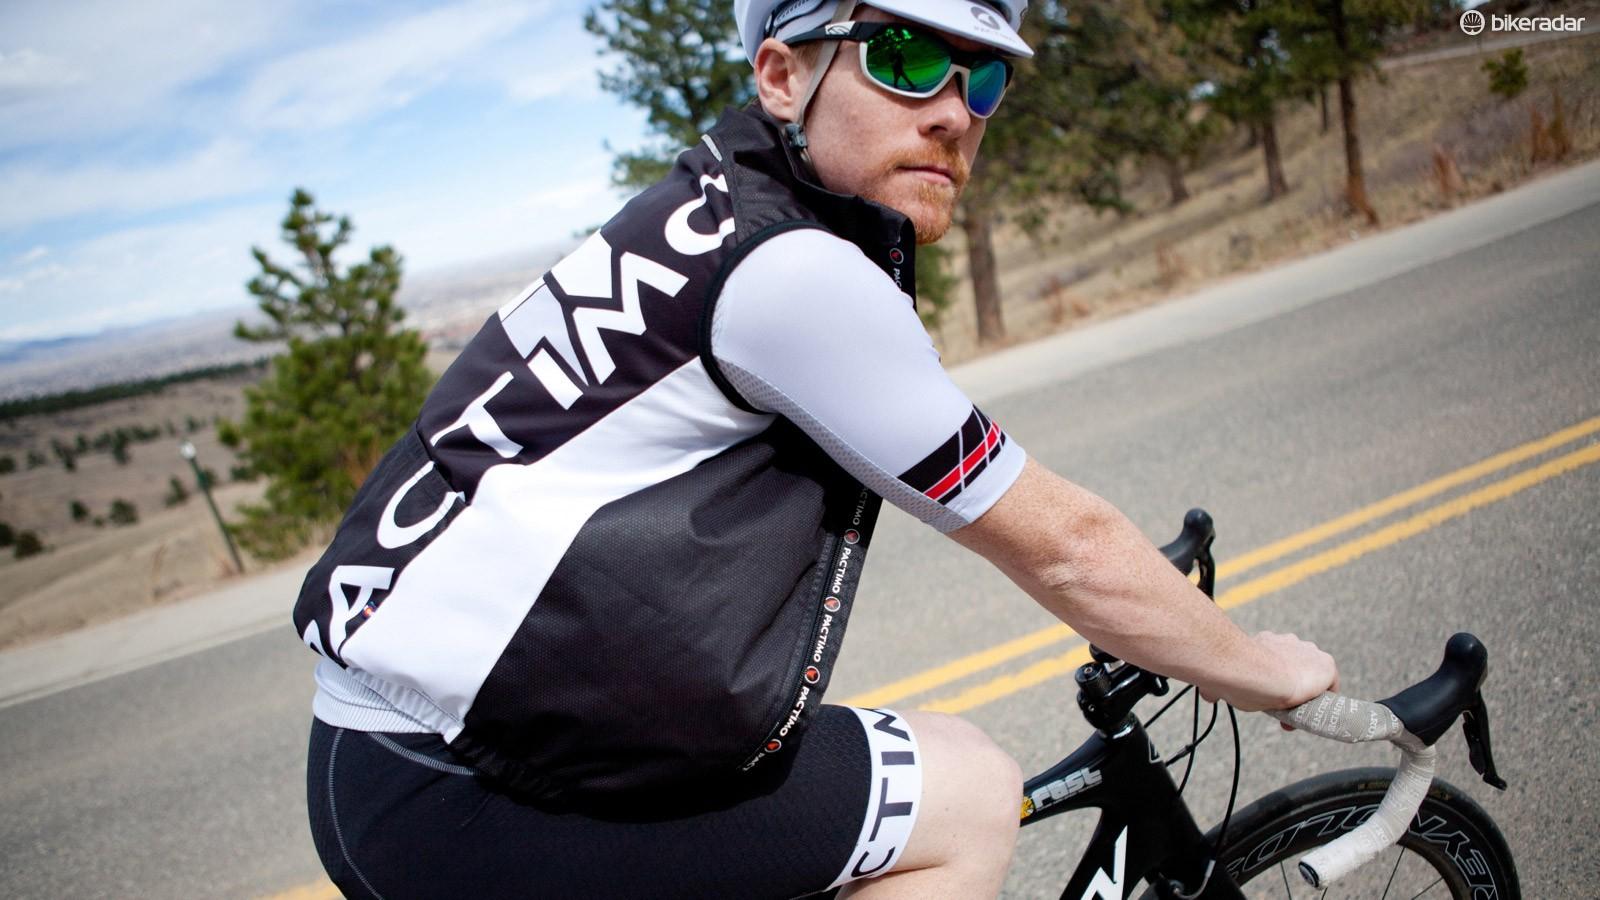 The Summit jersey and new Breckenridge W-XD vest